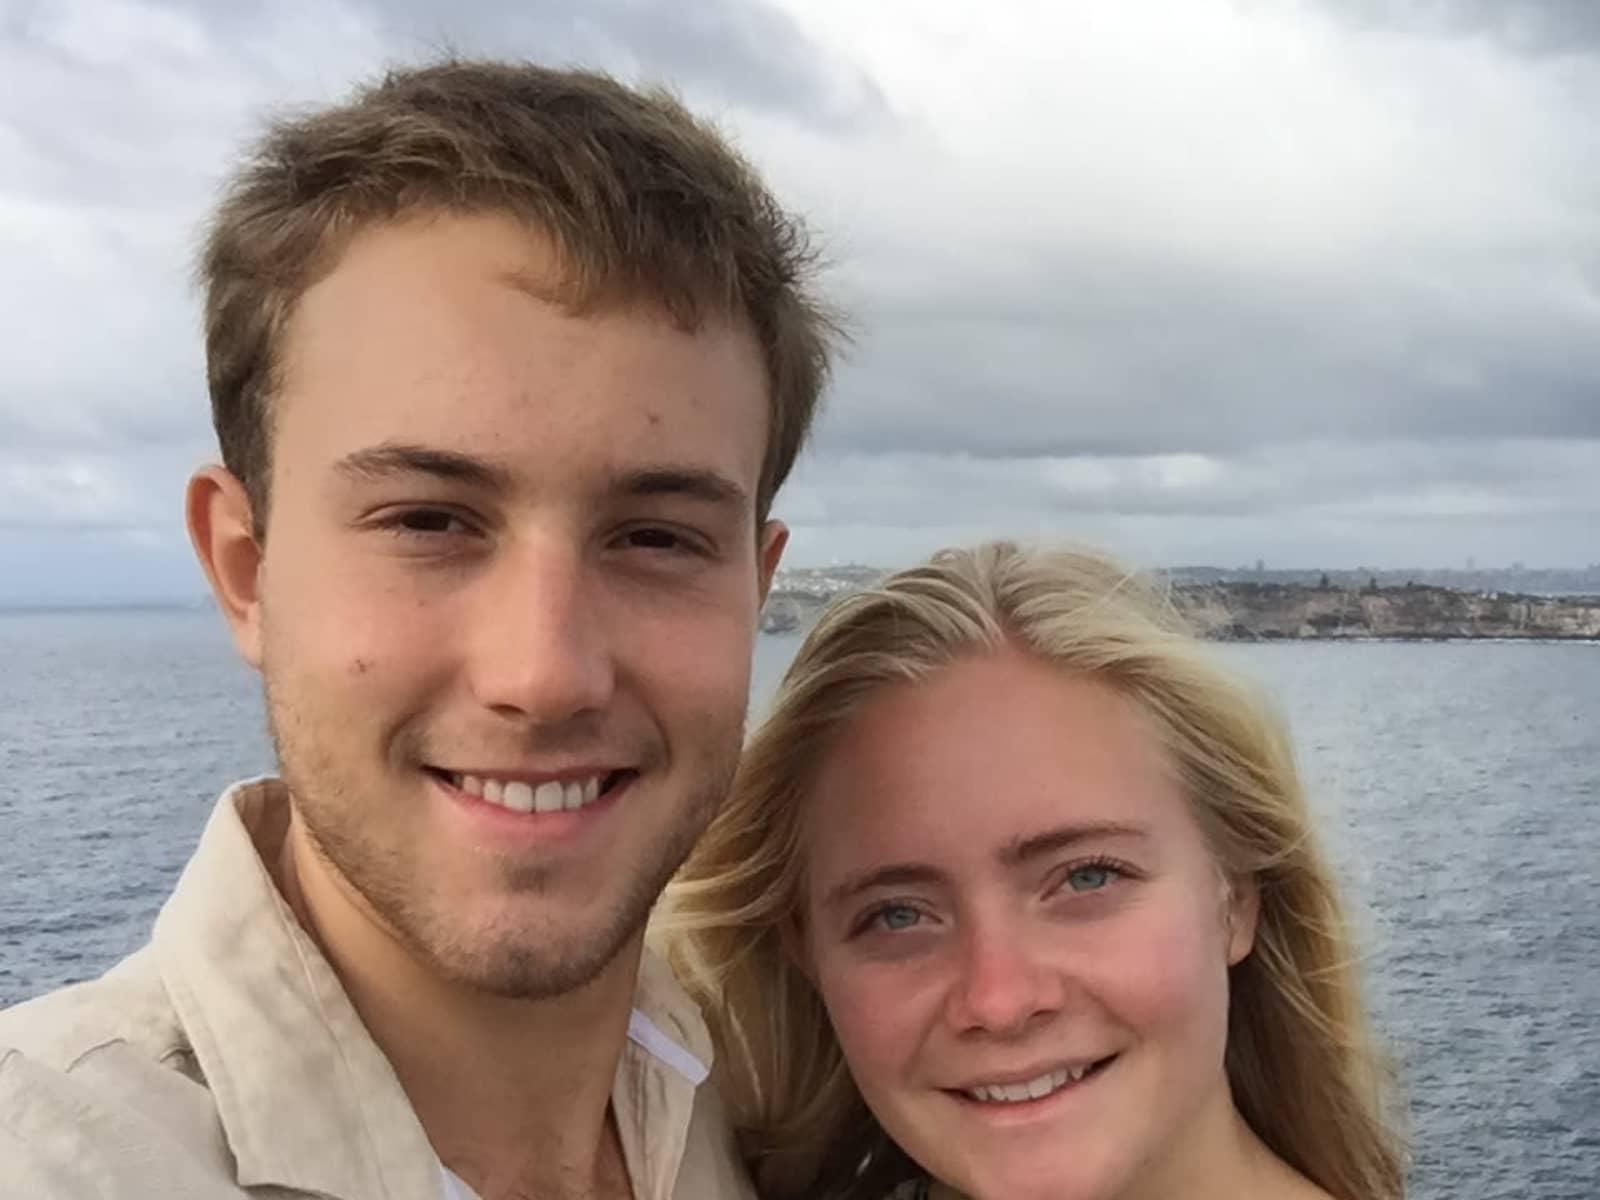 Frazer & Eilis from Perth, Western Australia, Australia